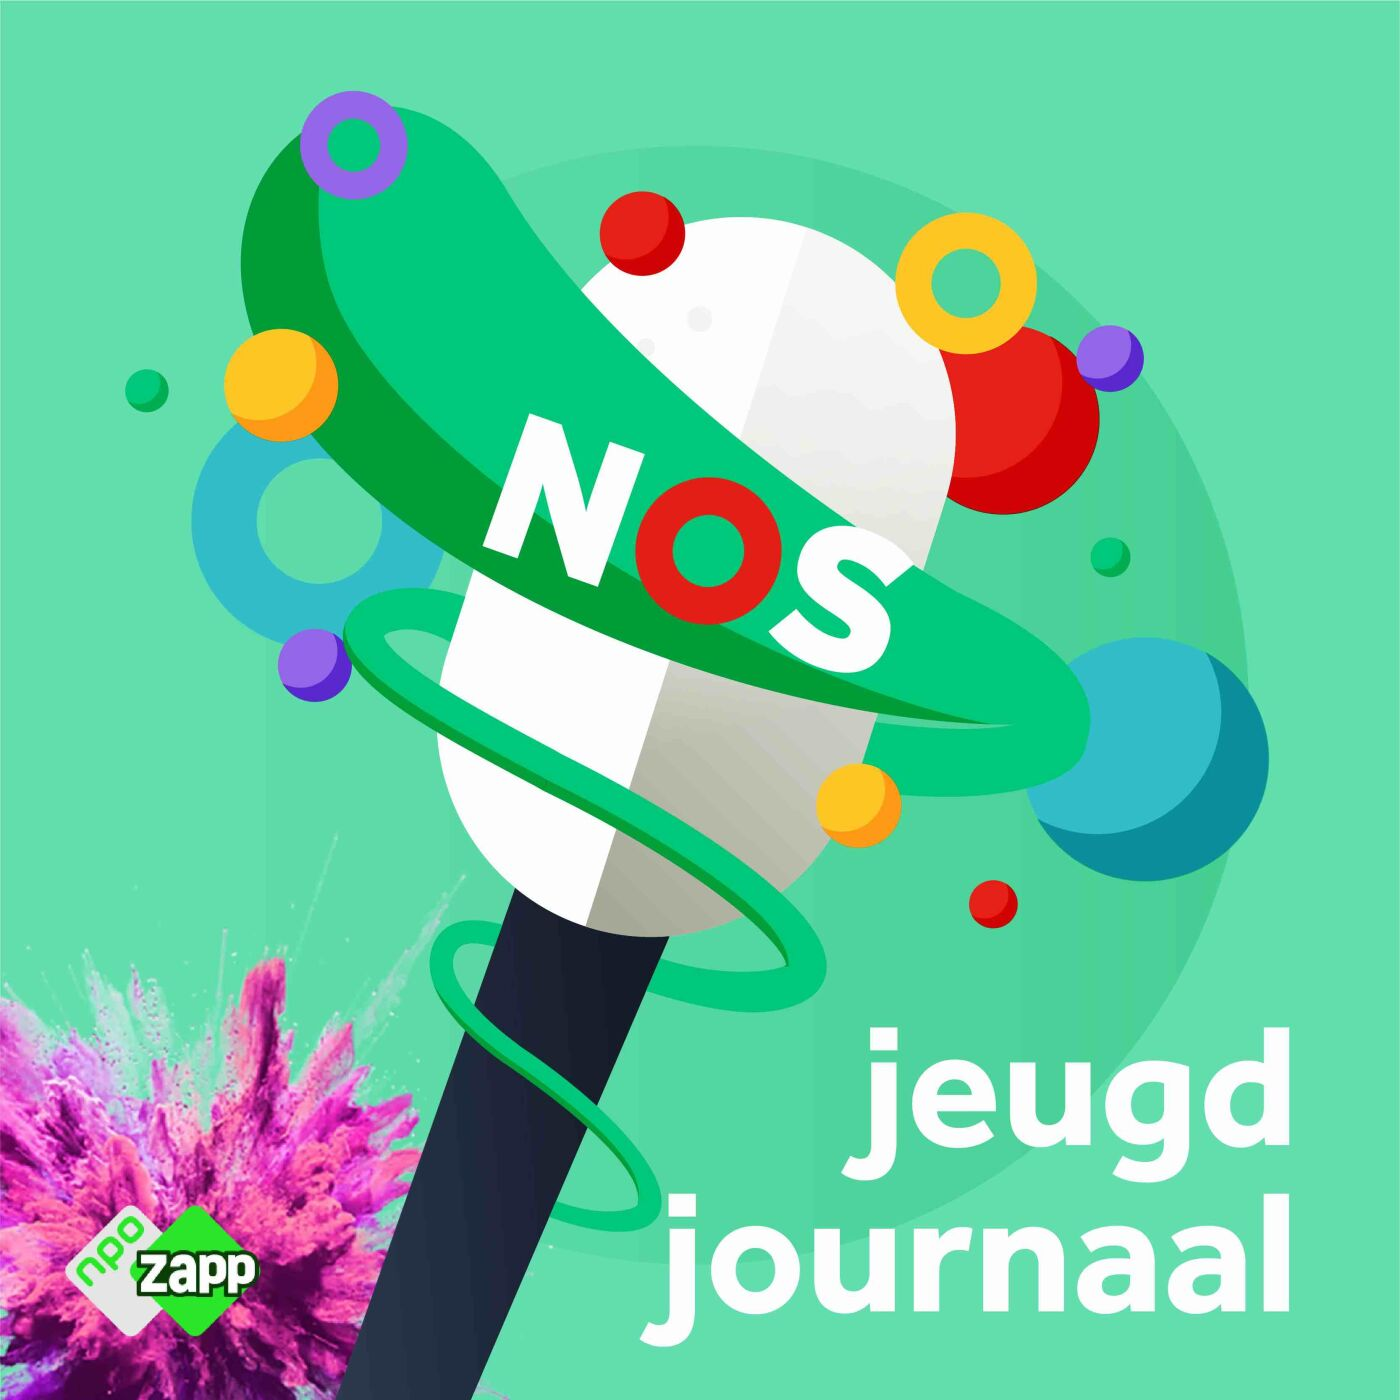 NOS Jeugdjournaal logo